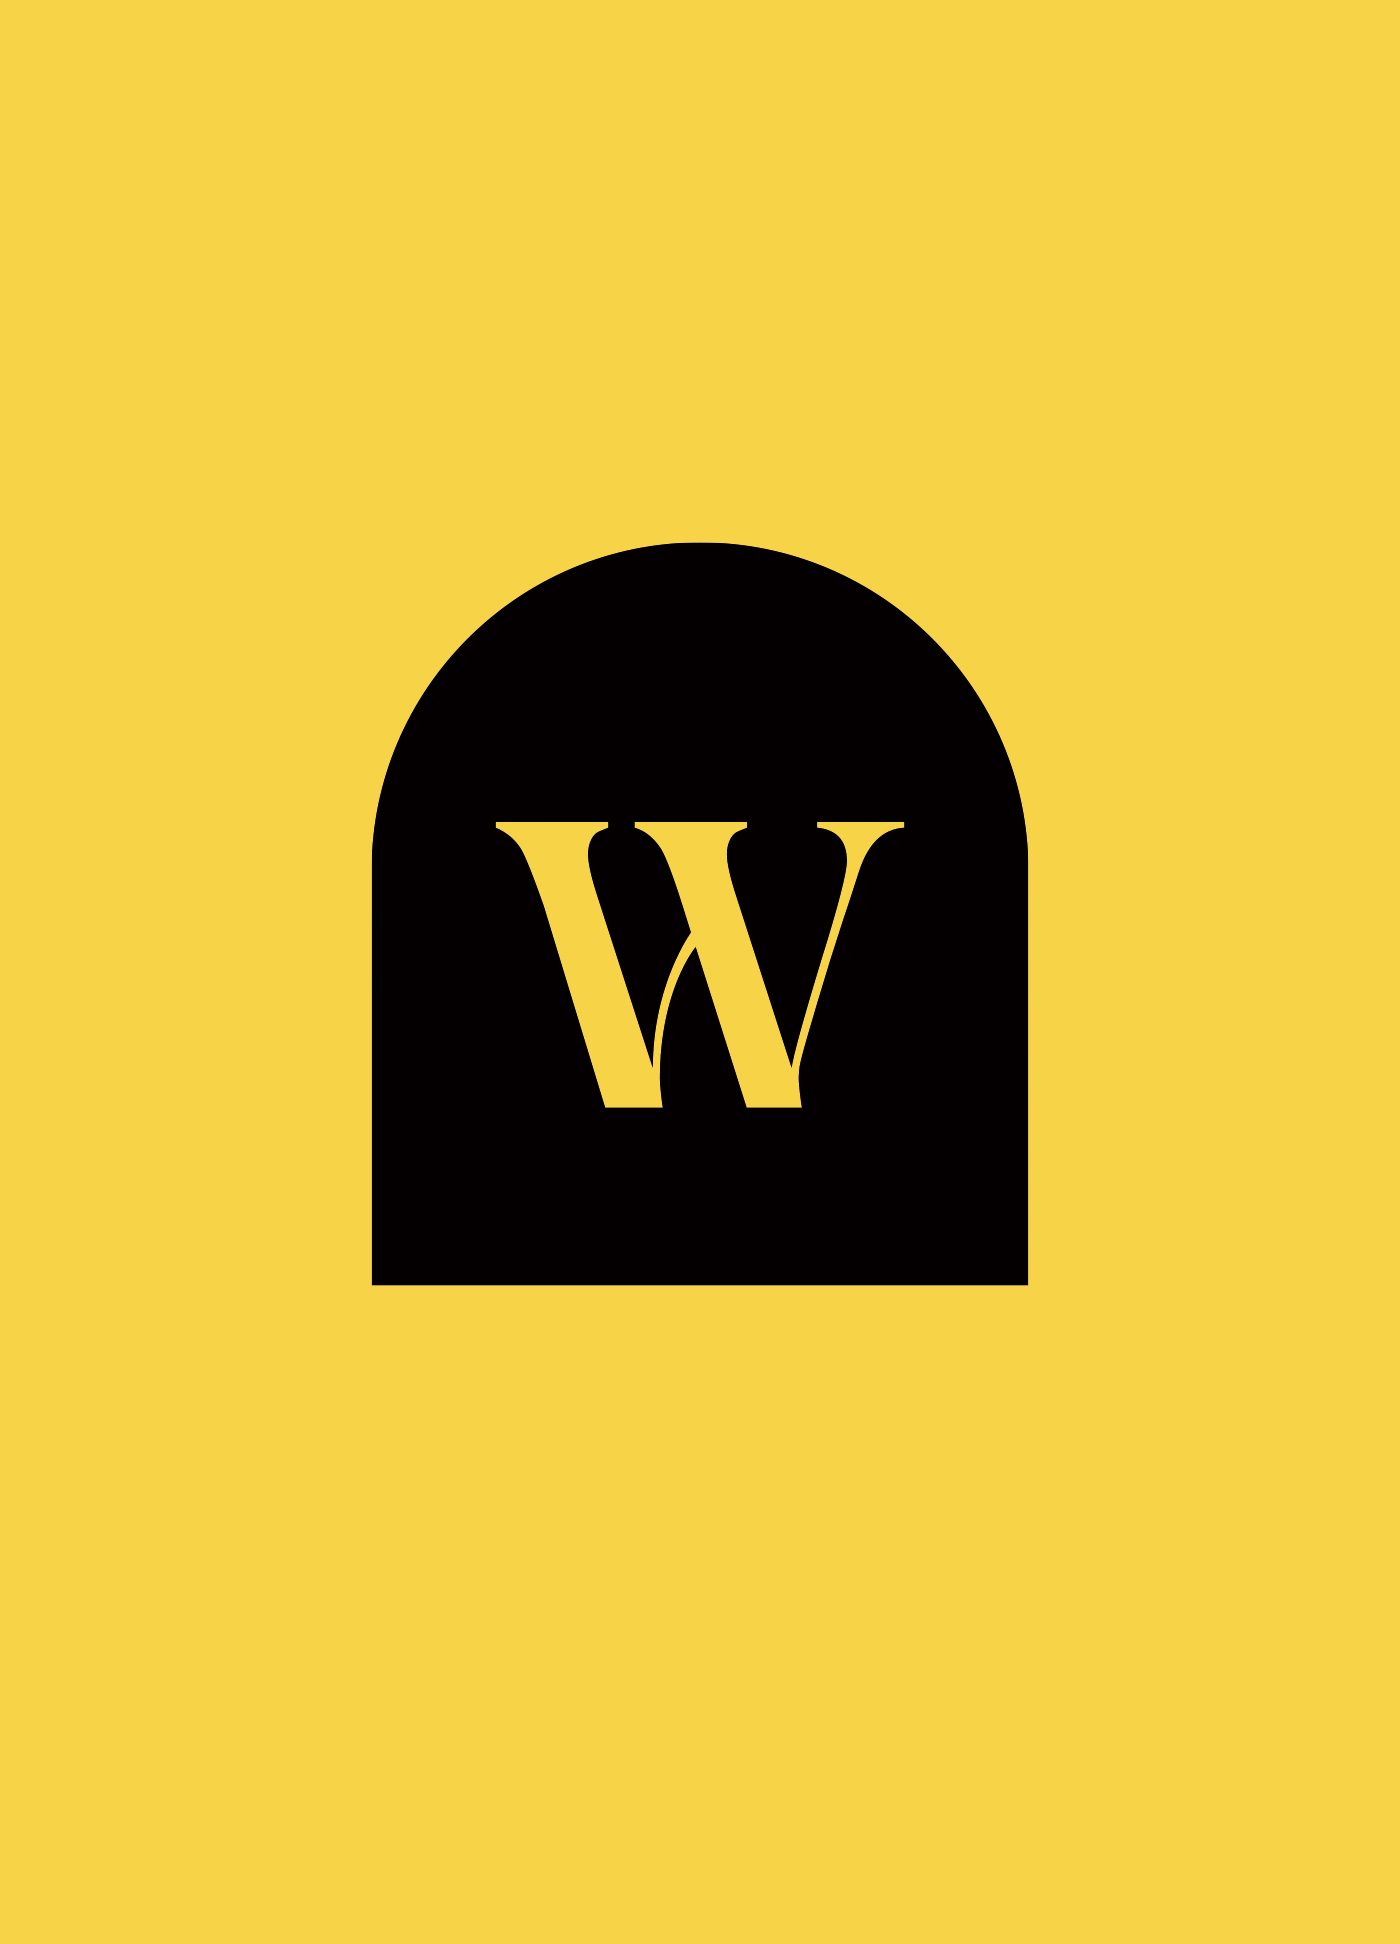 SCC_Wellnest_logo_06